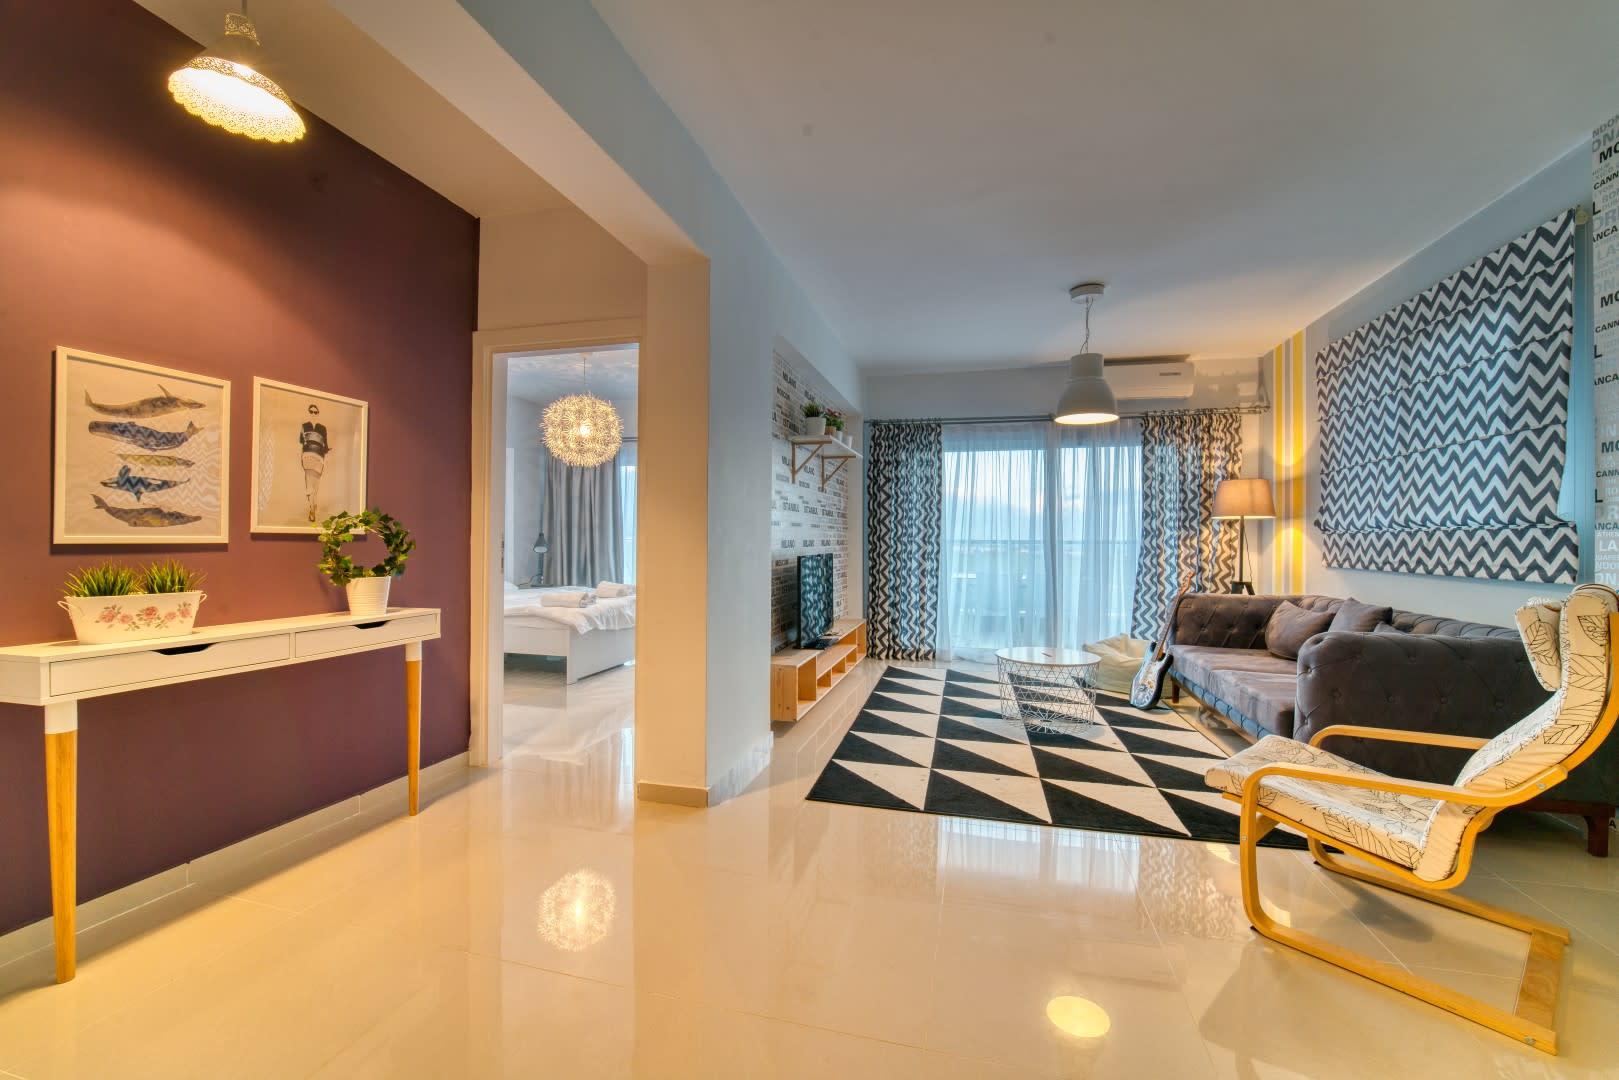 Long Beach İskele'de Lüks Rezidans'ta Satılık 3+1 Penthouse 8050